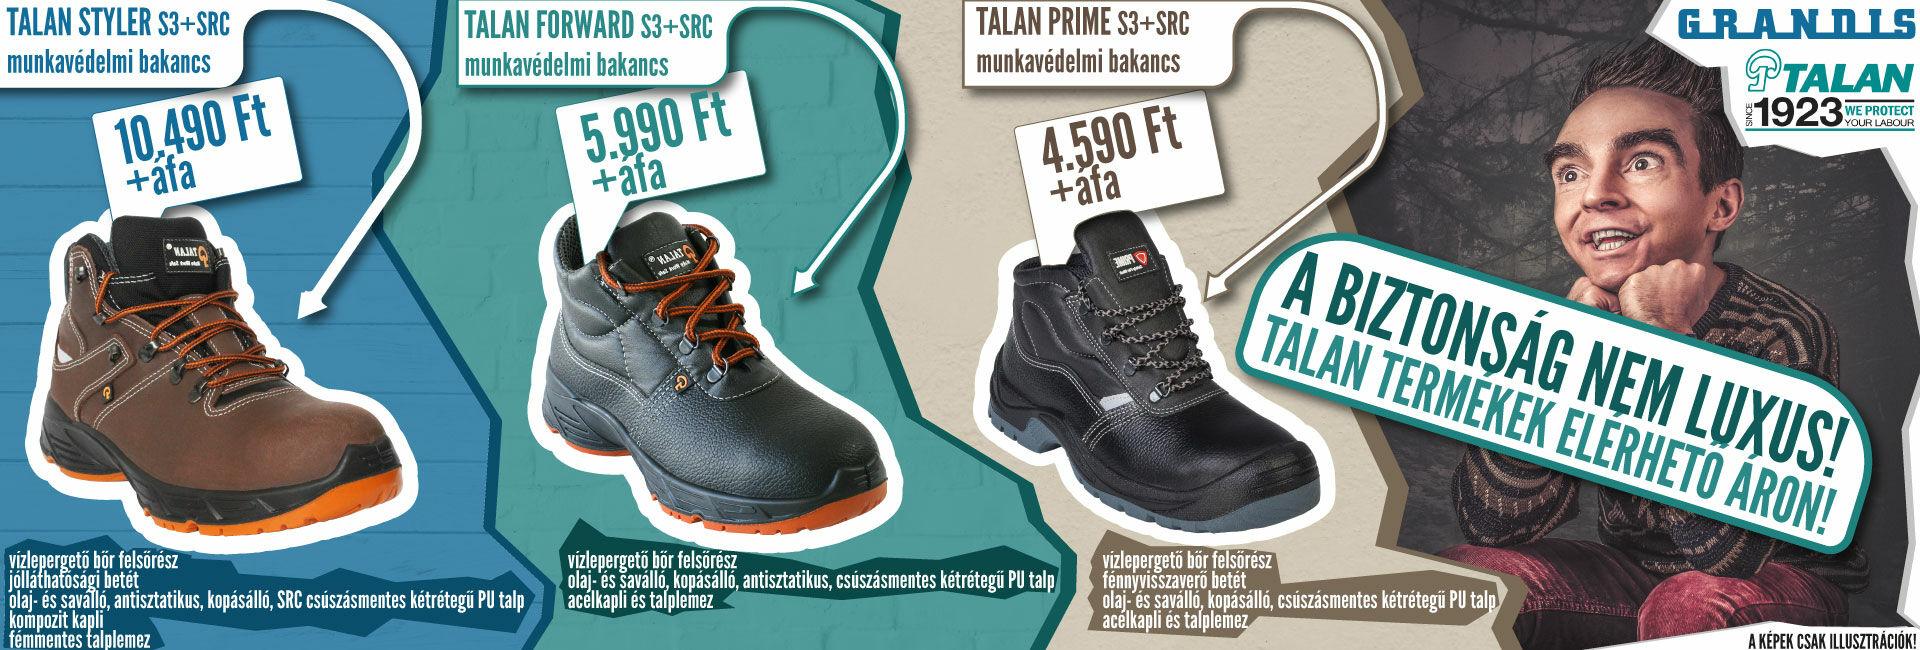 talan-styler-ch-2c111-3-forward-SE-2M112-3-prime-SP-2M0545-3-bakancsok-banner-grandis-hu